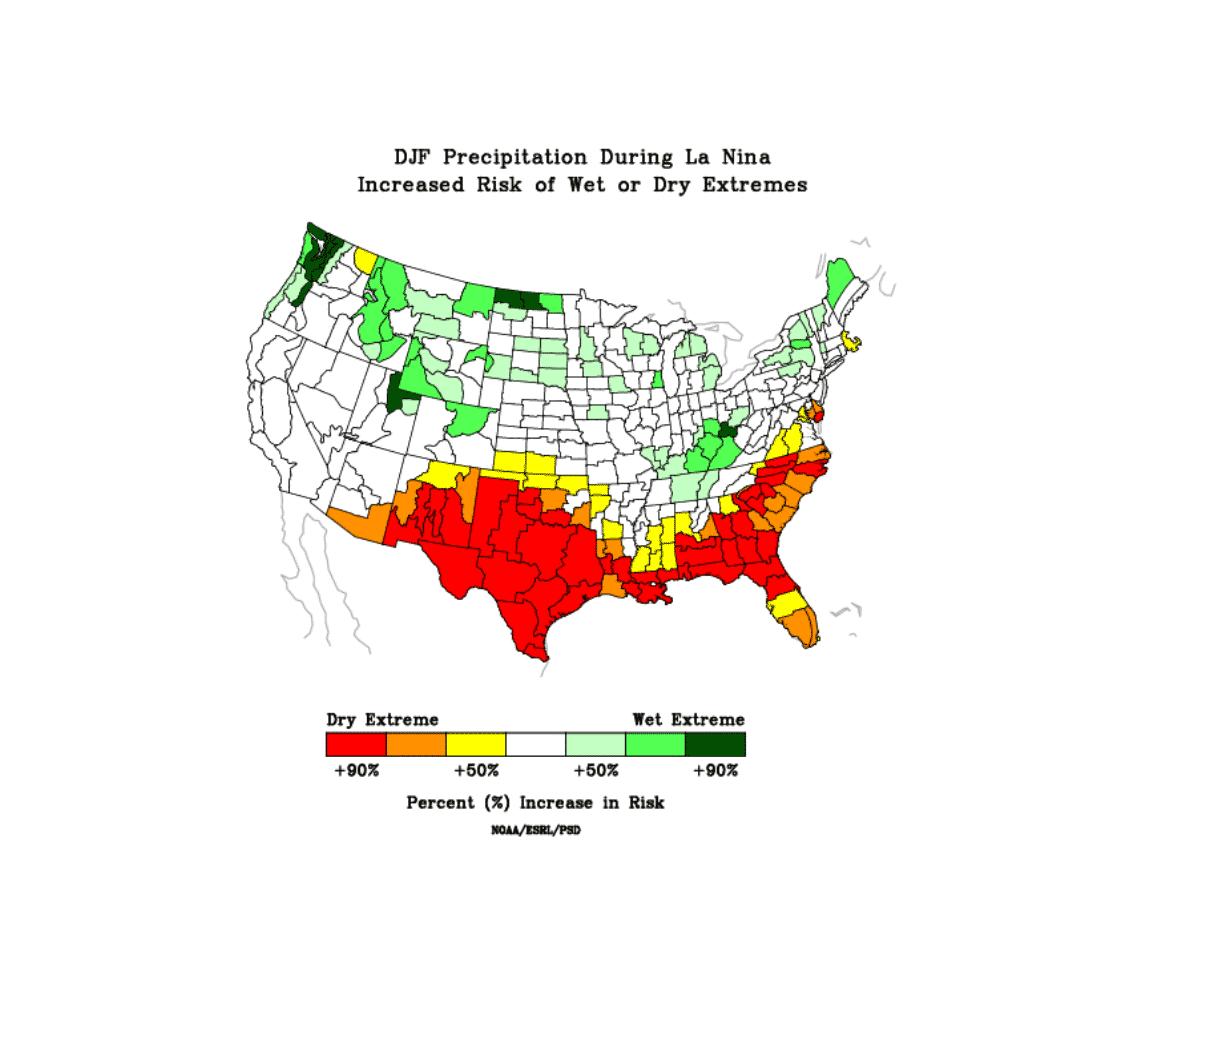 winter-forecast-season-enso-la-nina-precipitation-impact-united-states